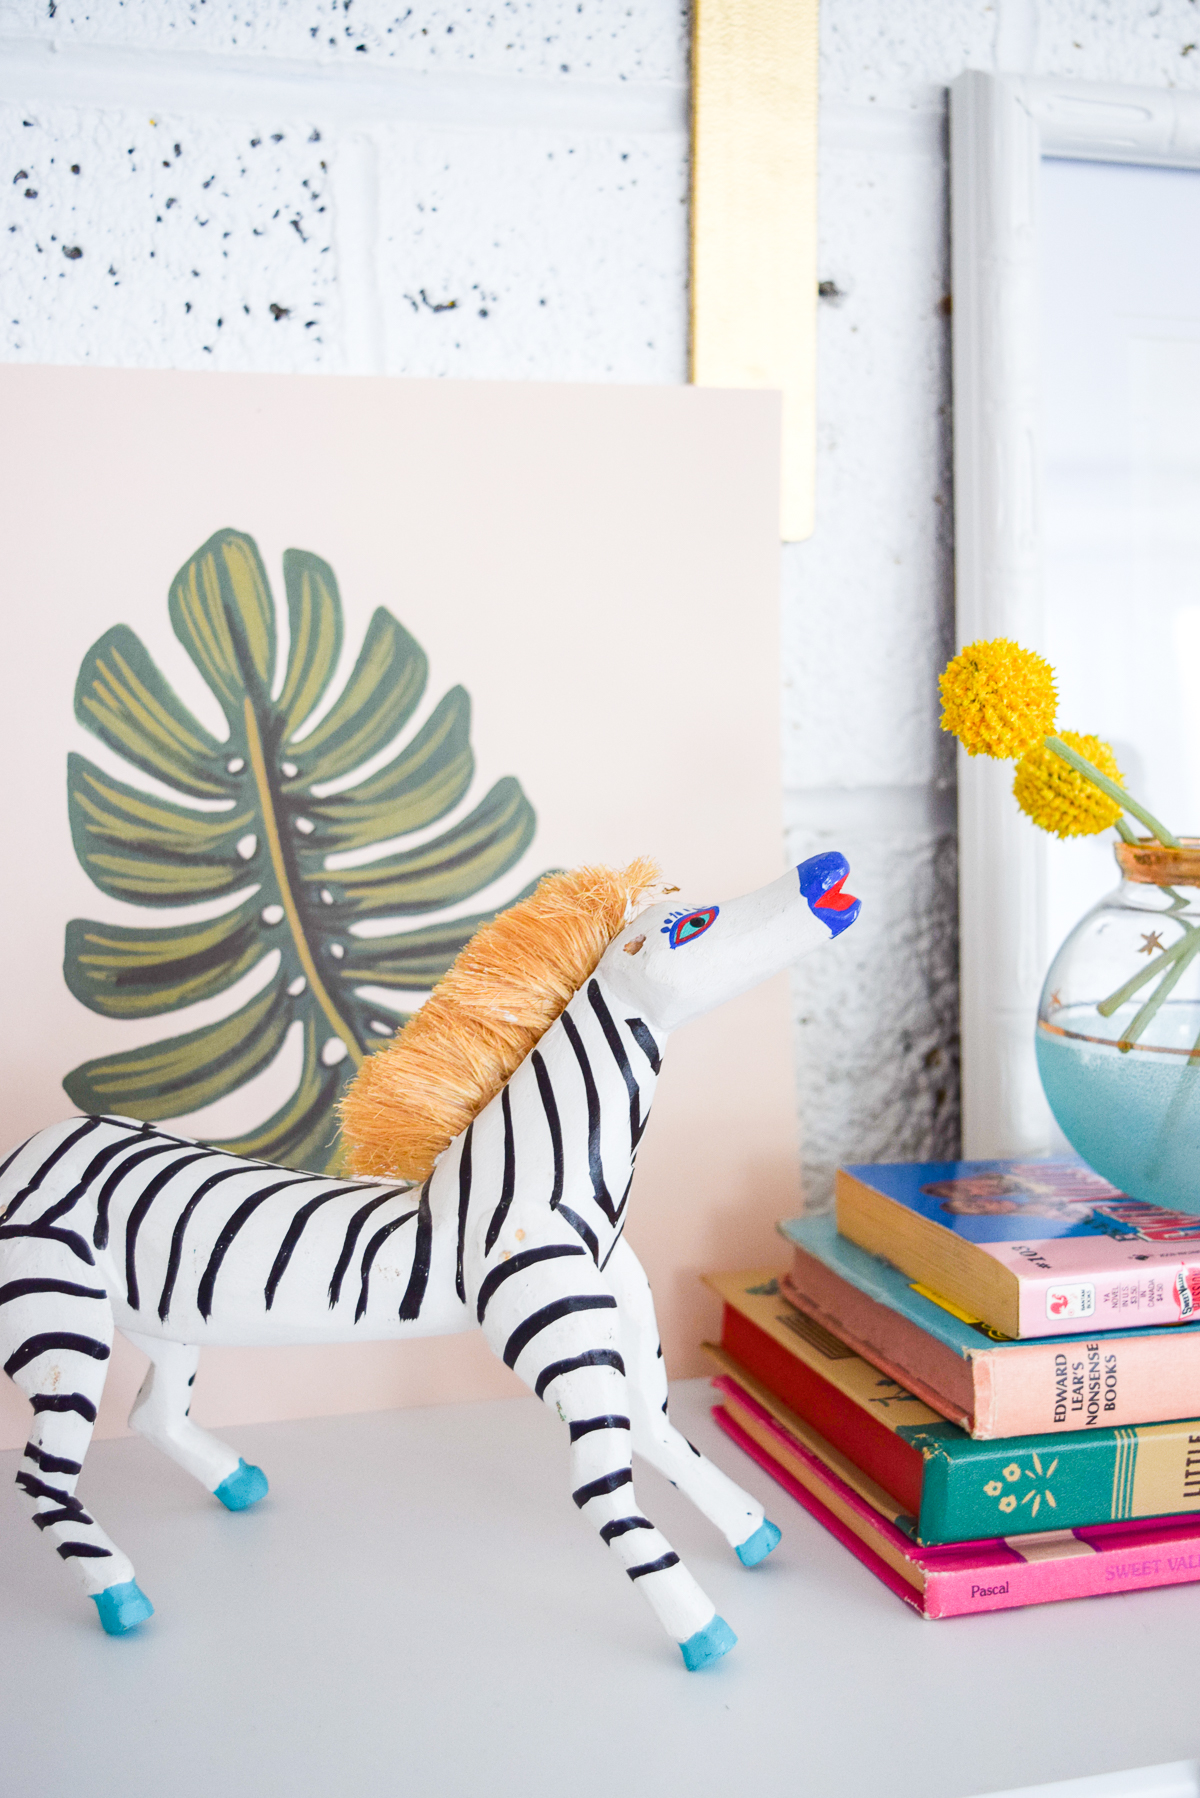 handmade wooden zebra on a shelf